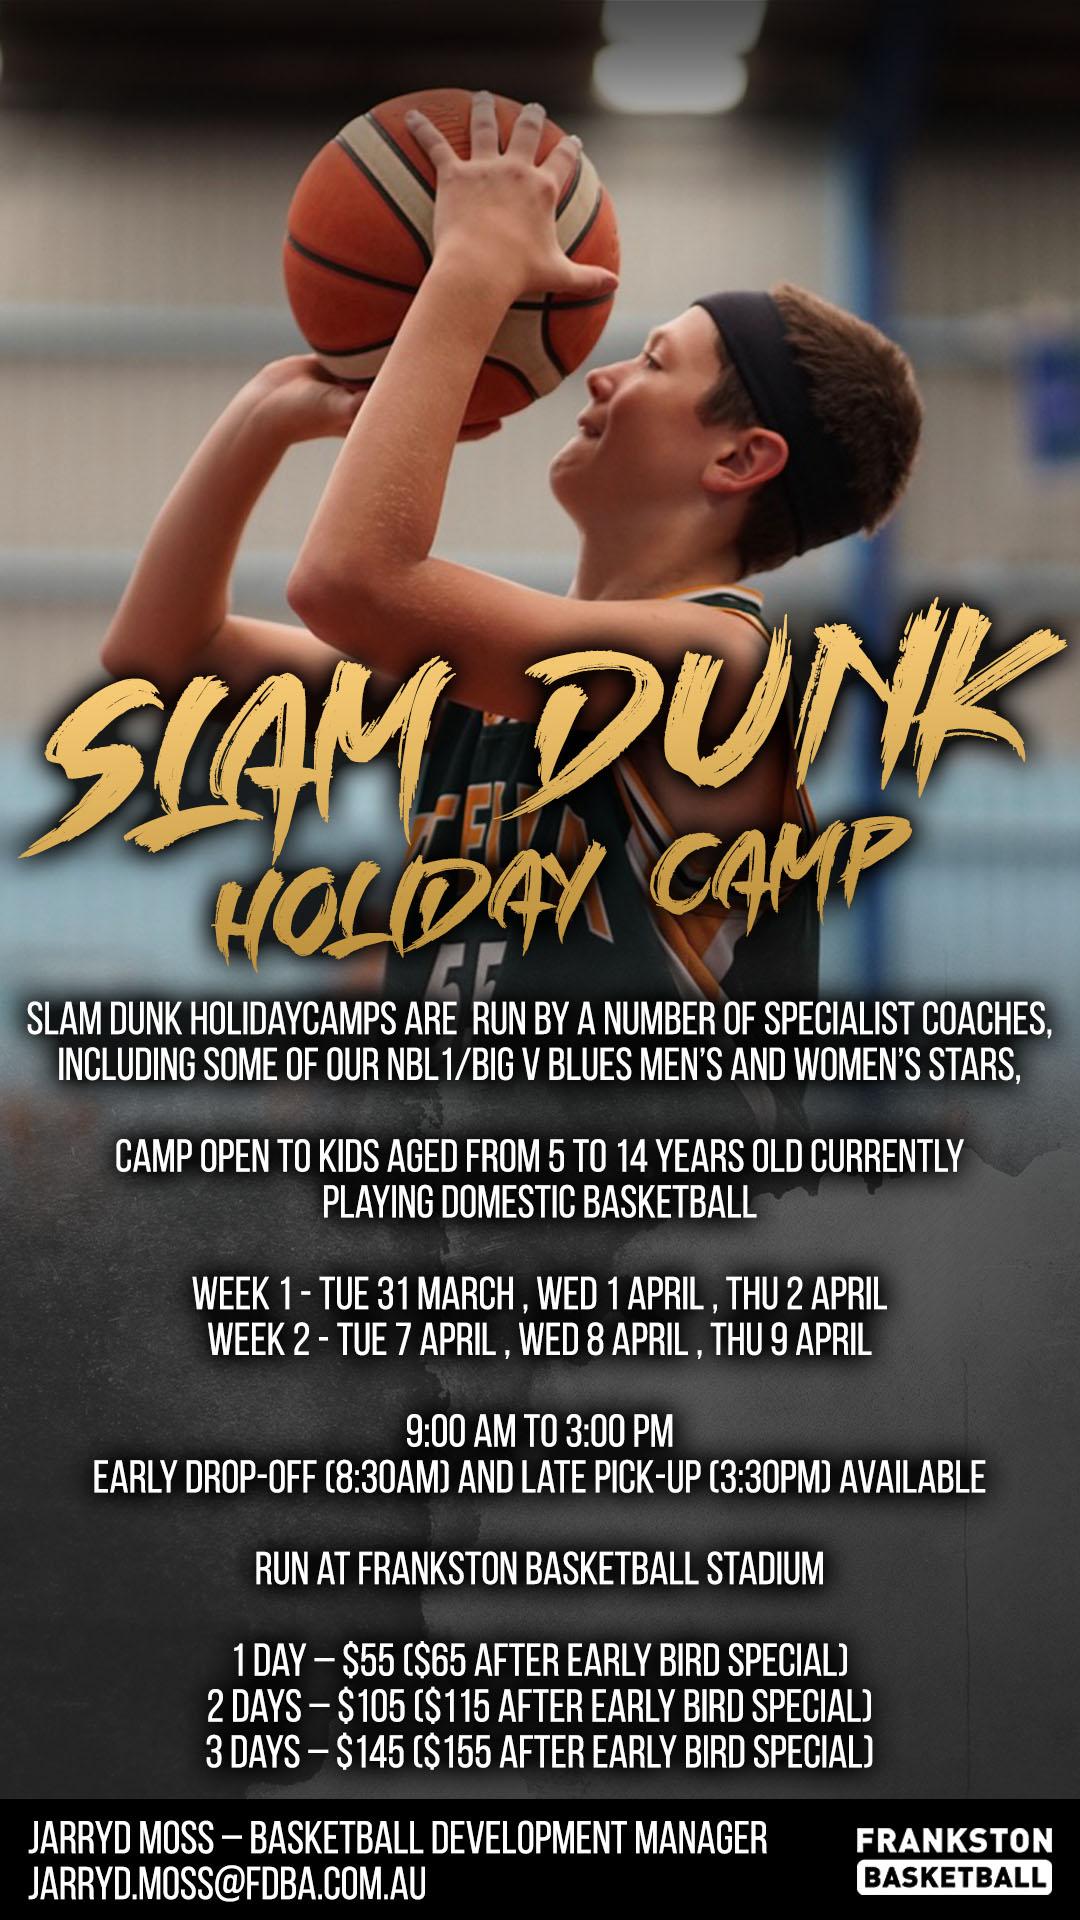 SlamDunkHolidayCamp